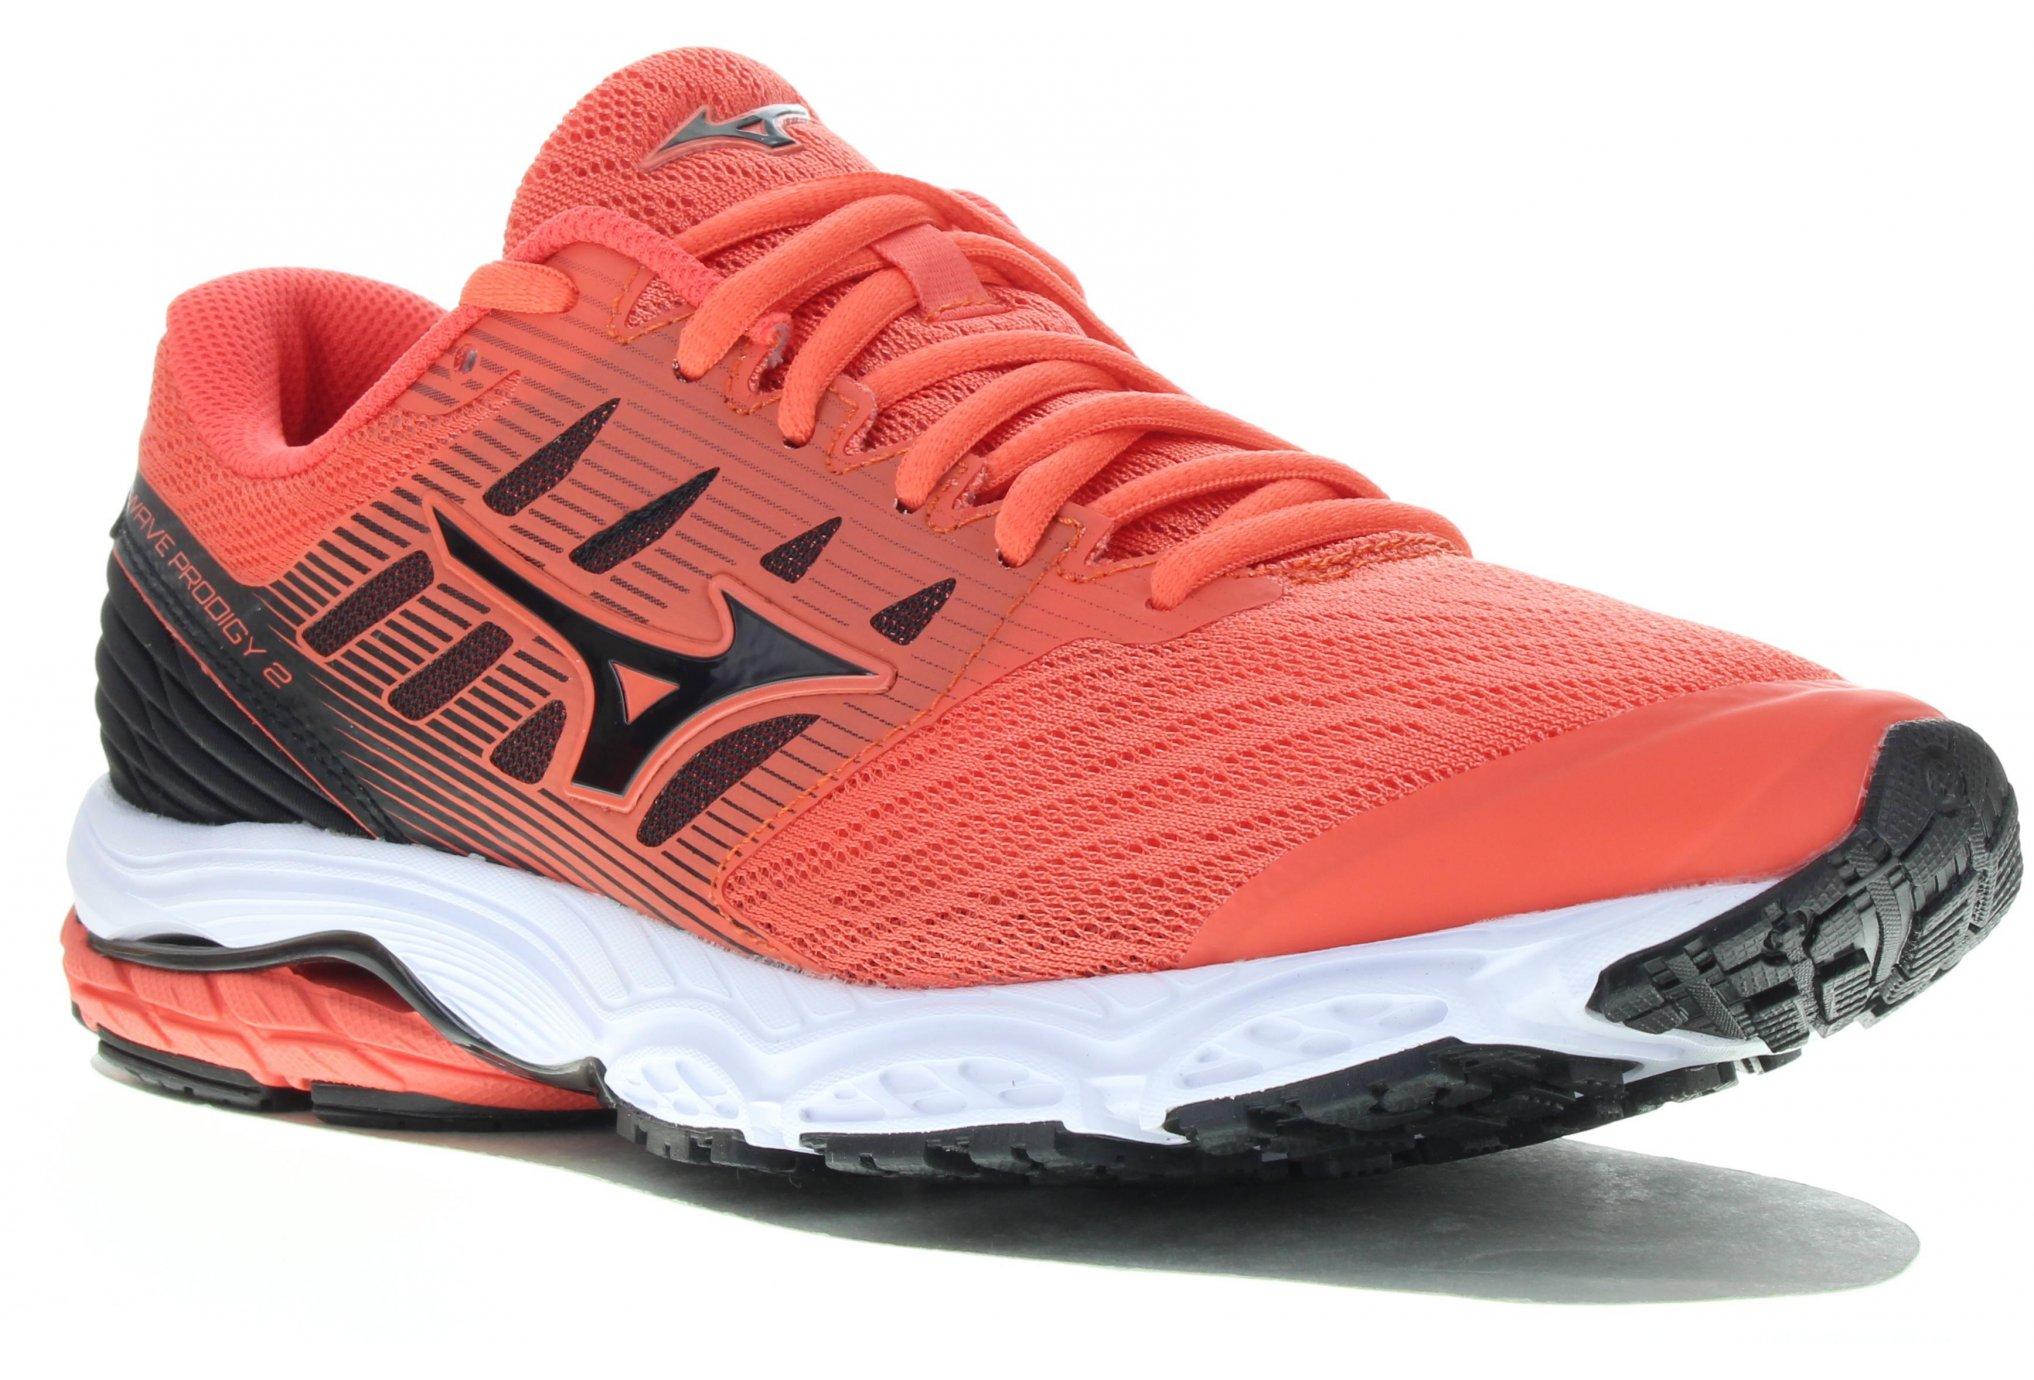 Mizuno Wave Prodigy 2 Chaussures running femme